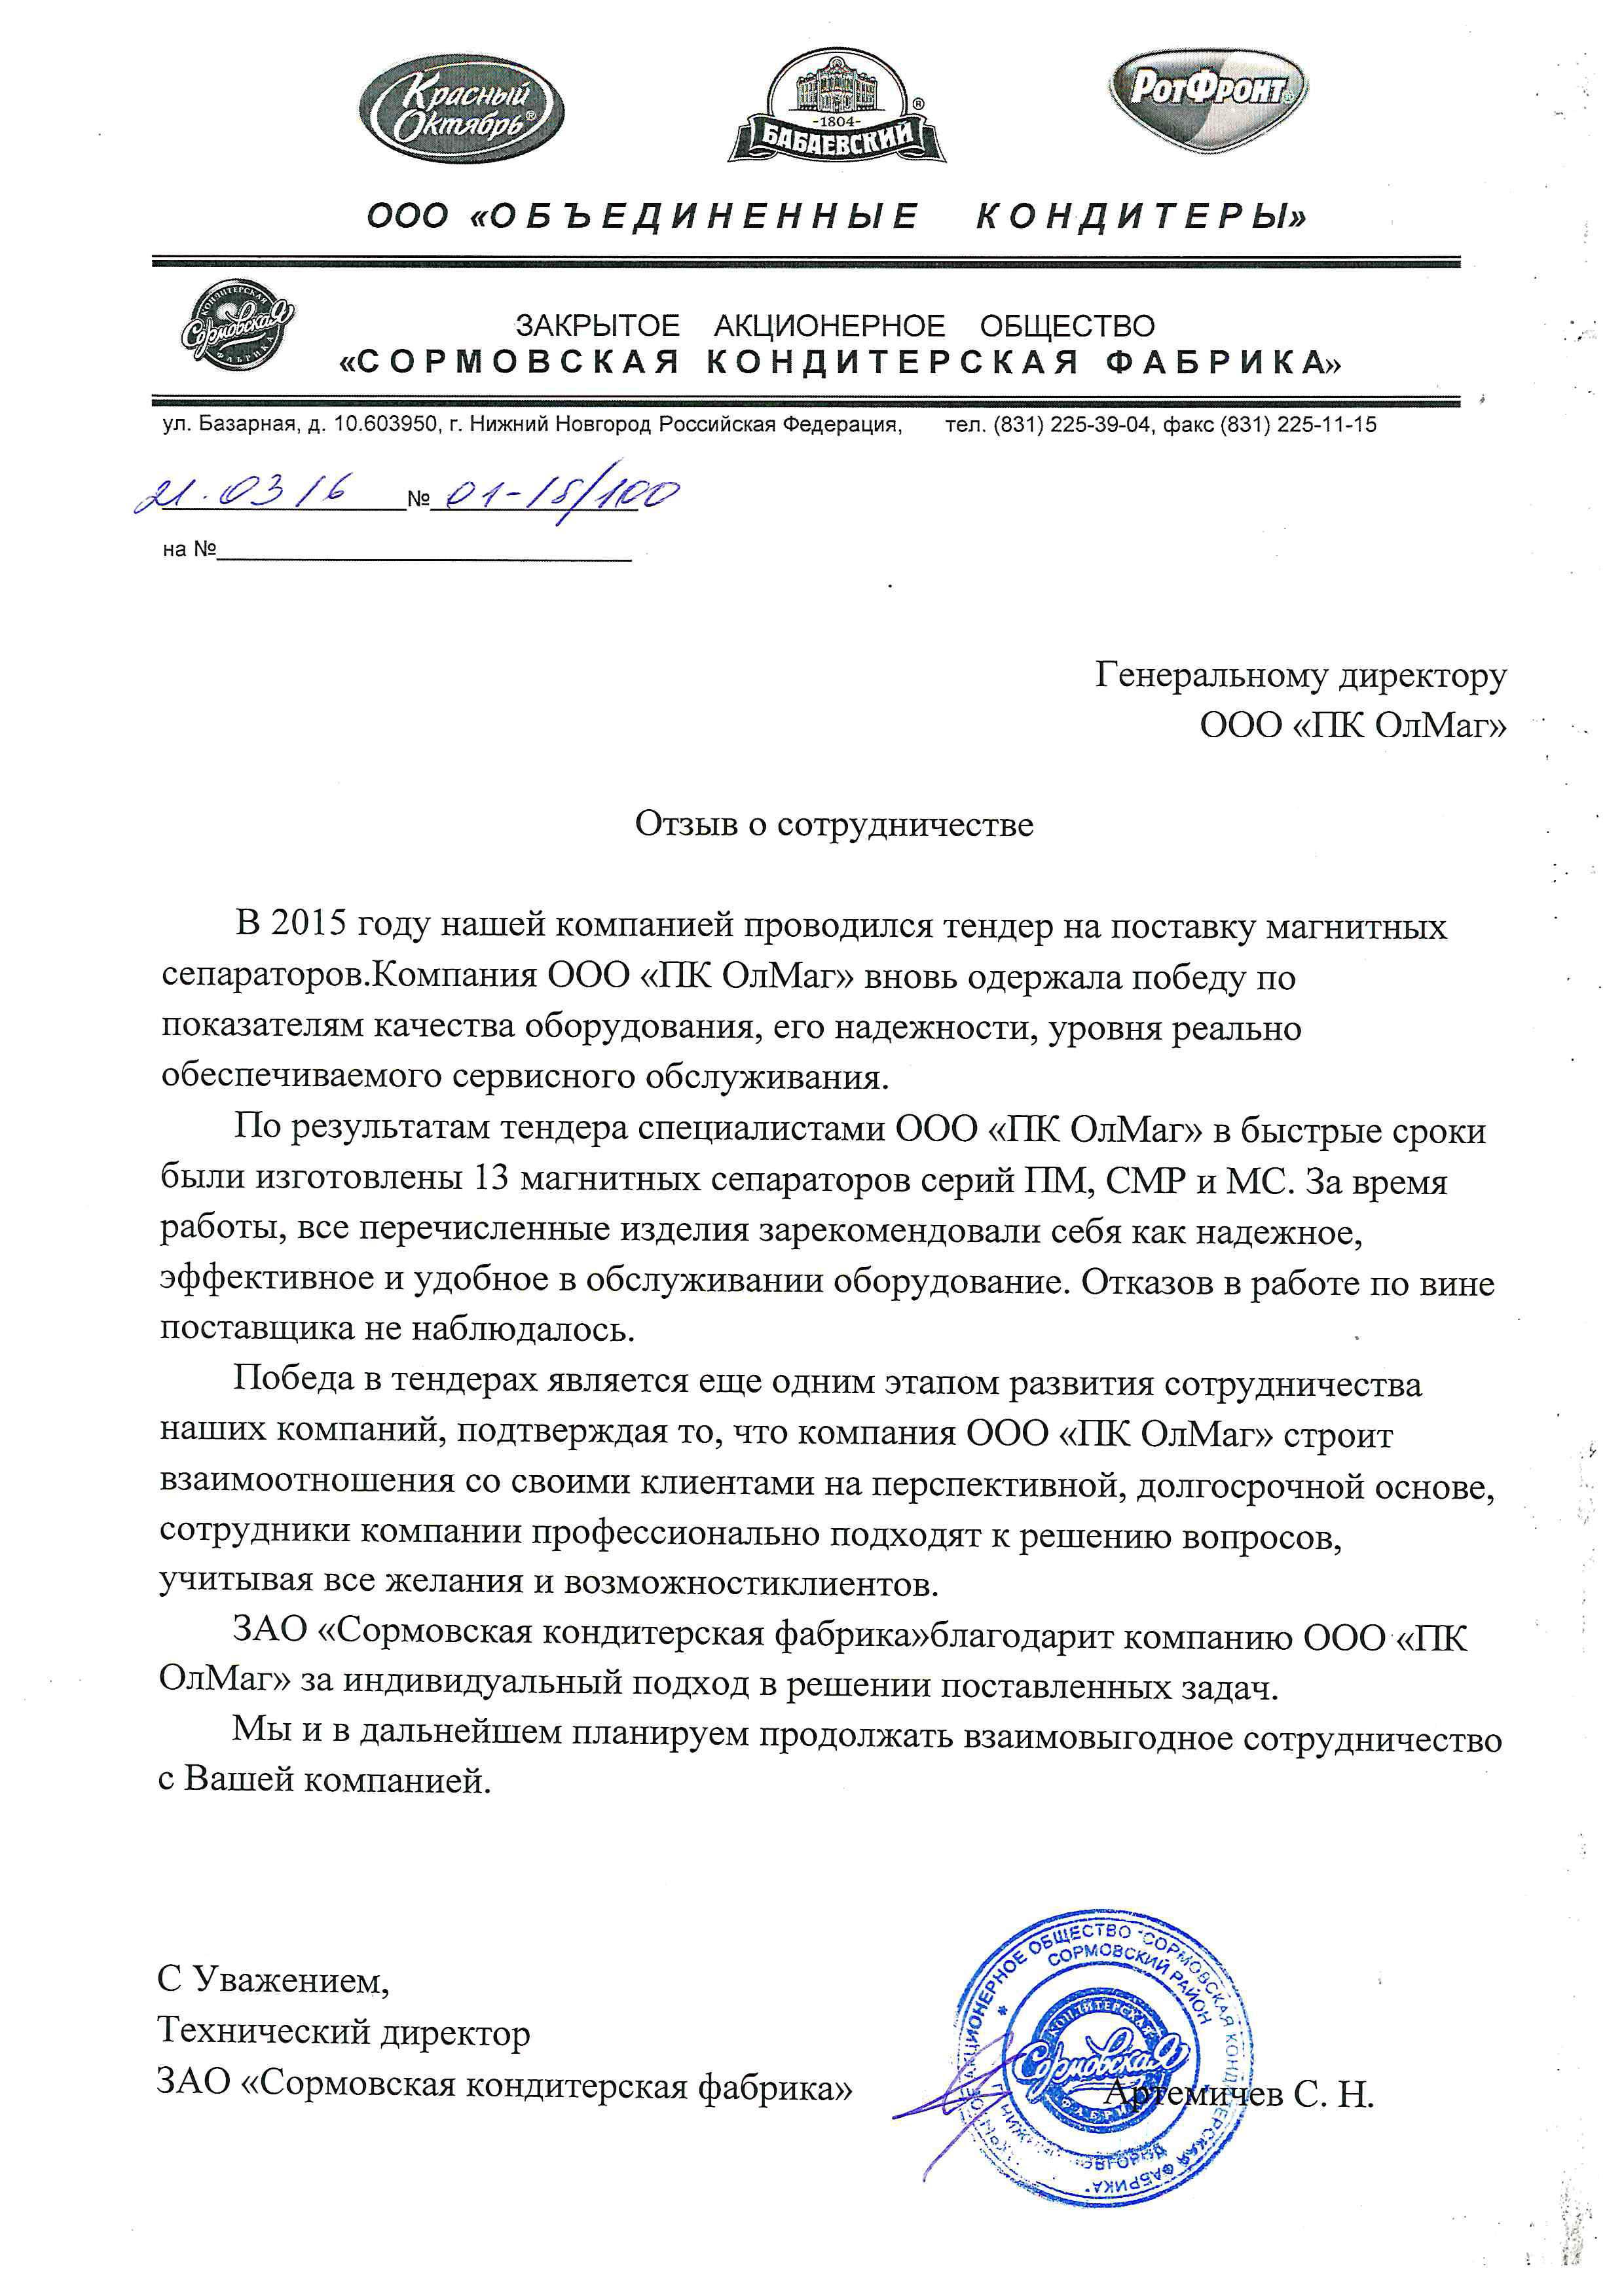 sormovskay konditerskay fabrika-1